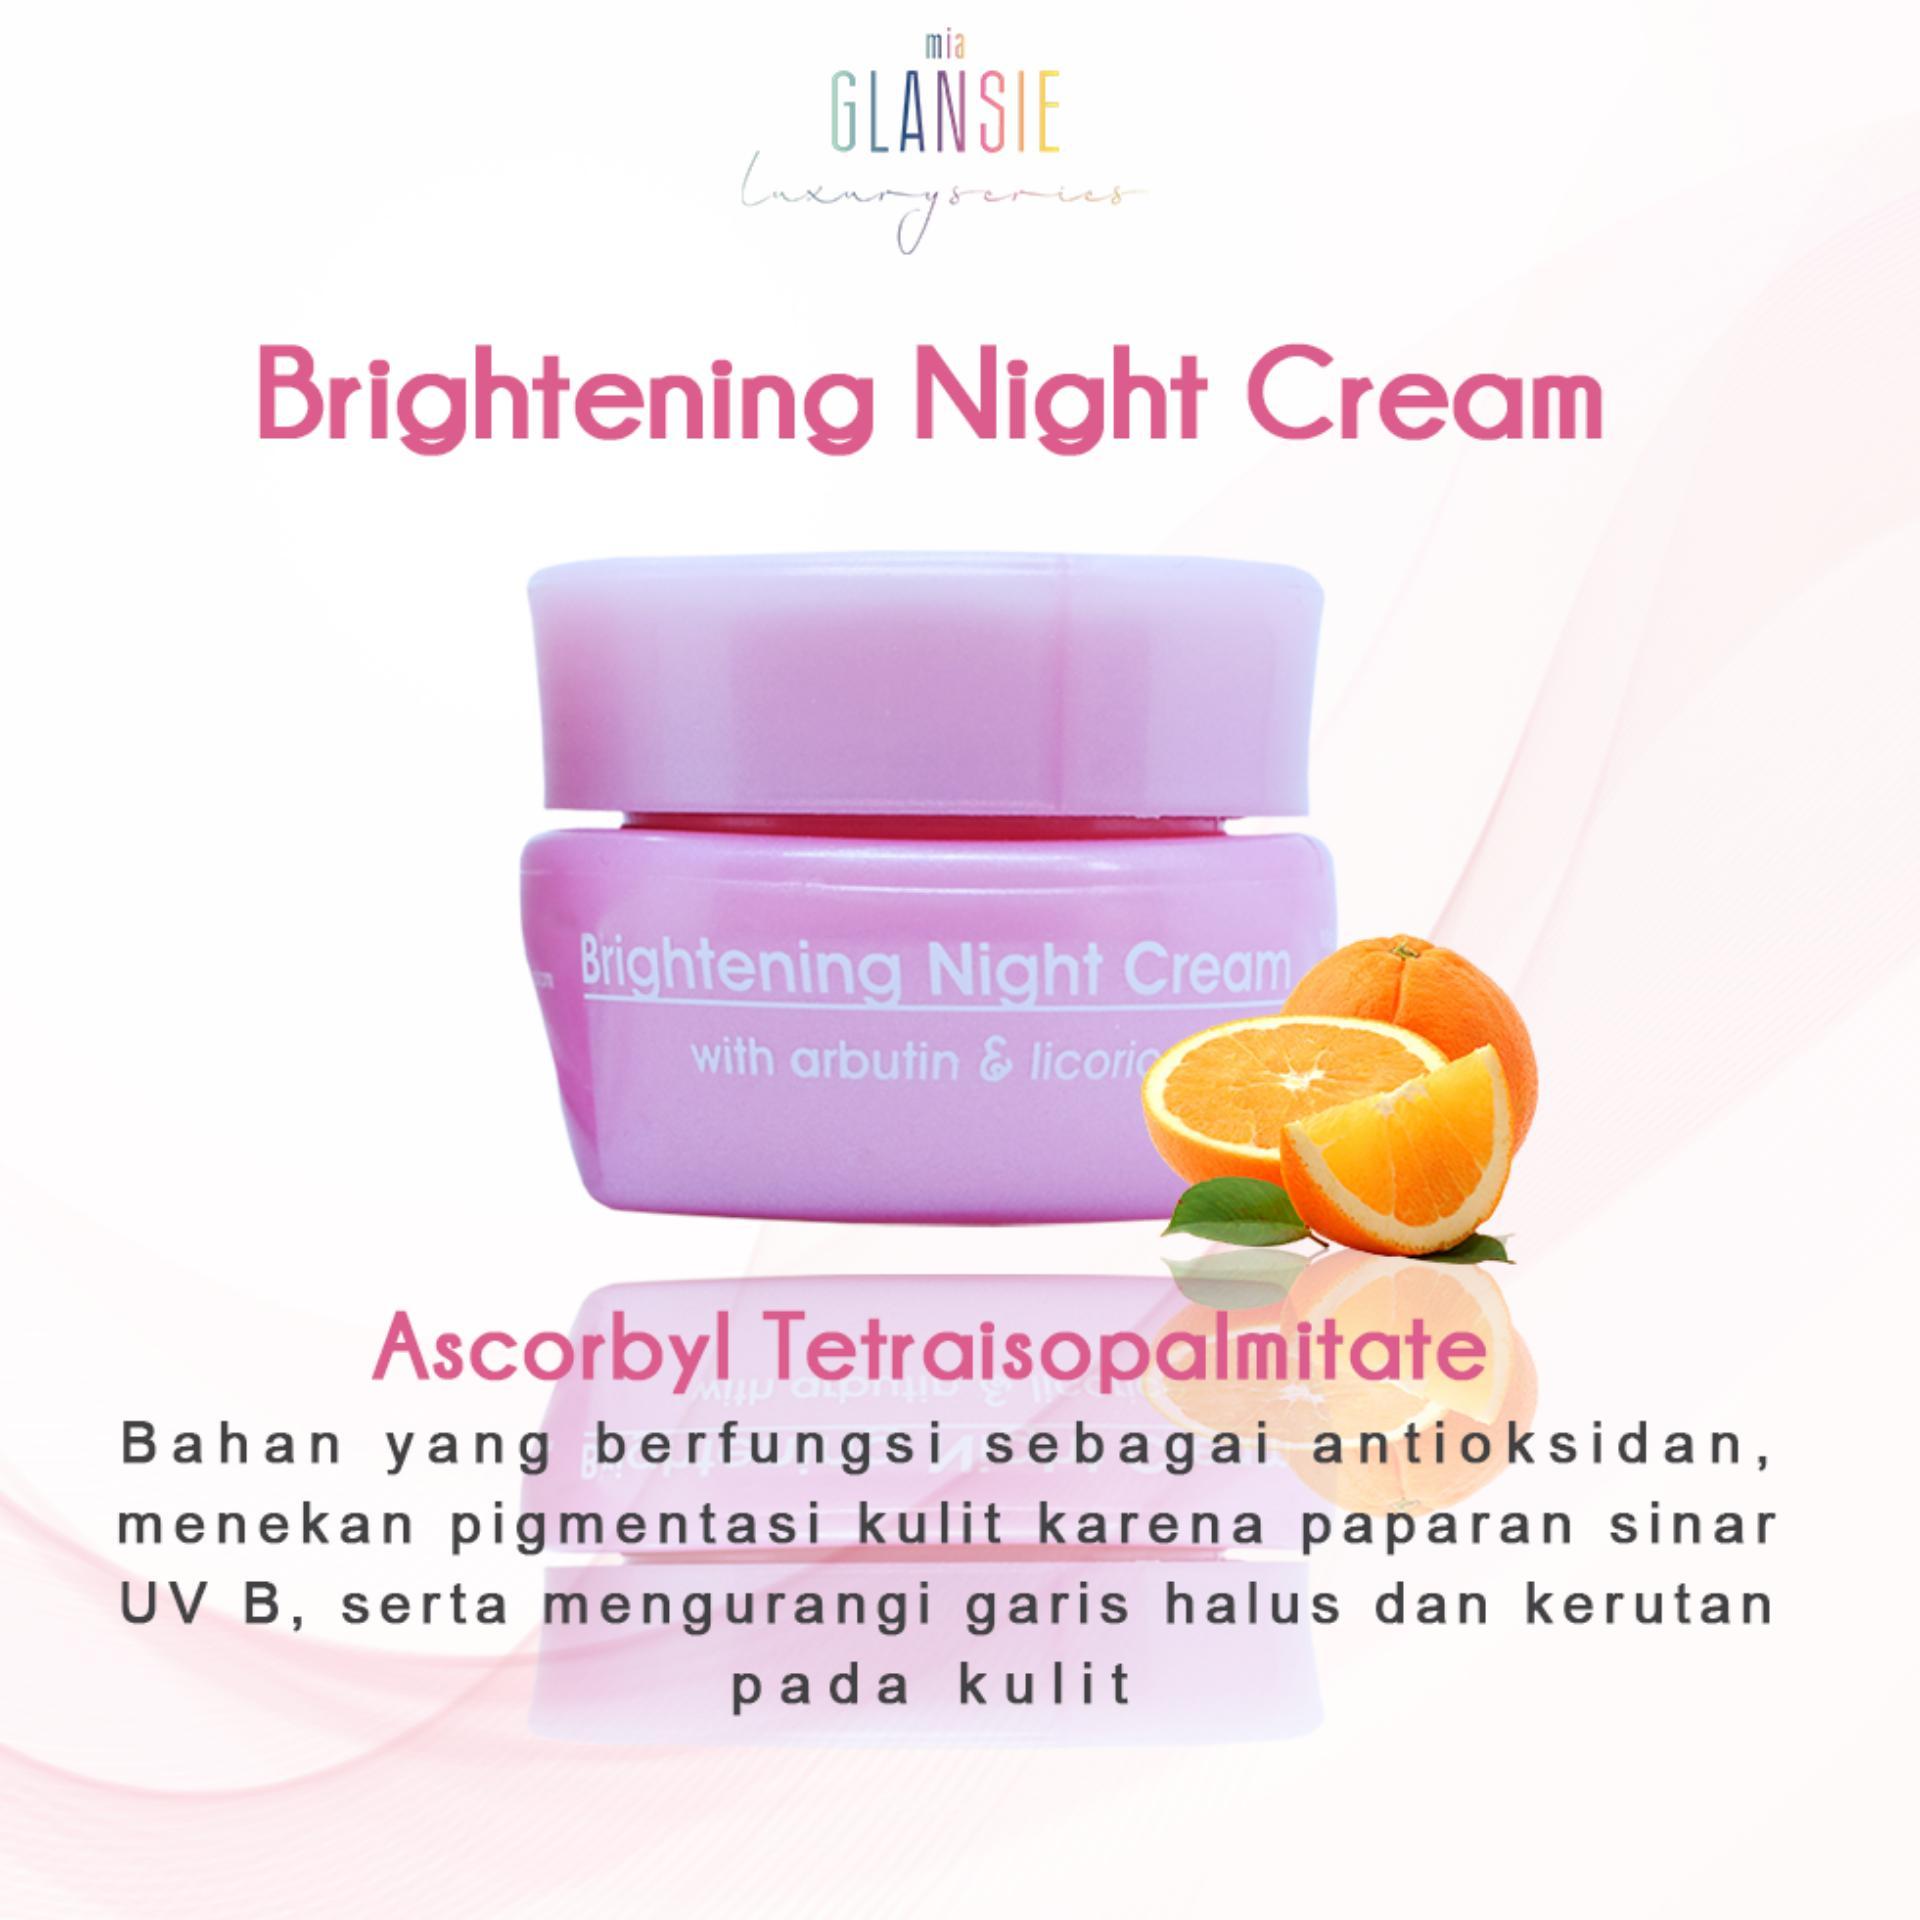 Fitur Glansie Luxury Bpom Paket Brightening Dan Harga Terbaru Skincare Normal Sabun Batang 5